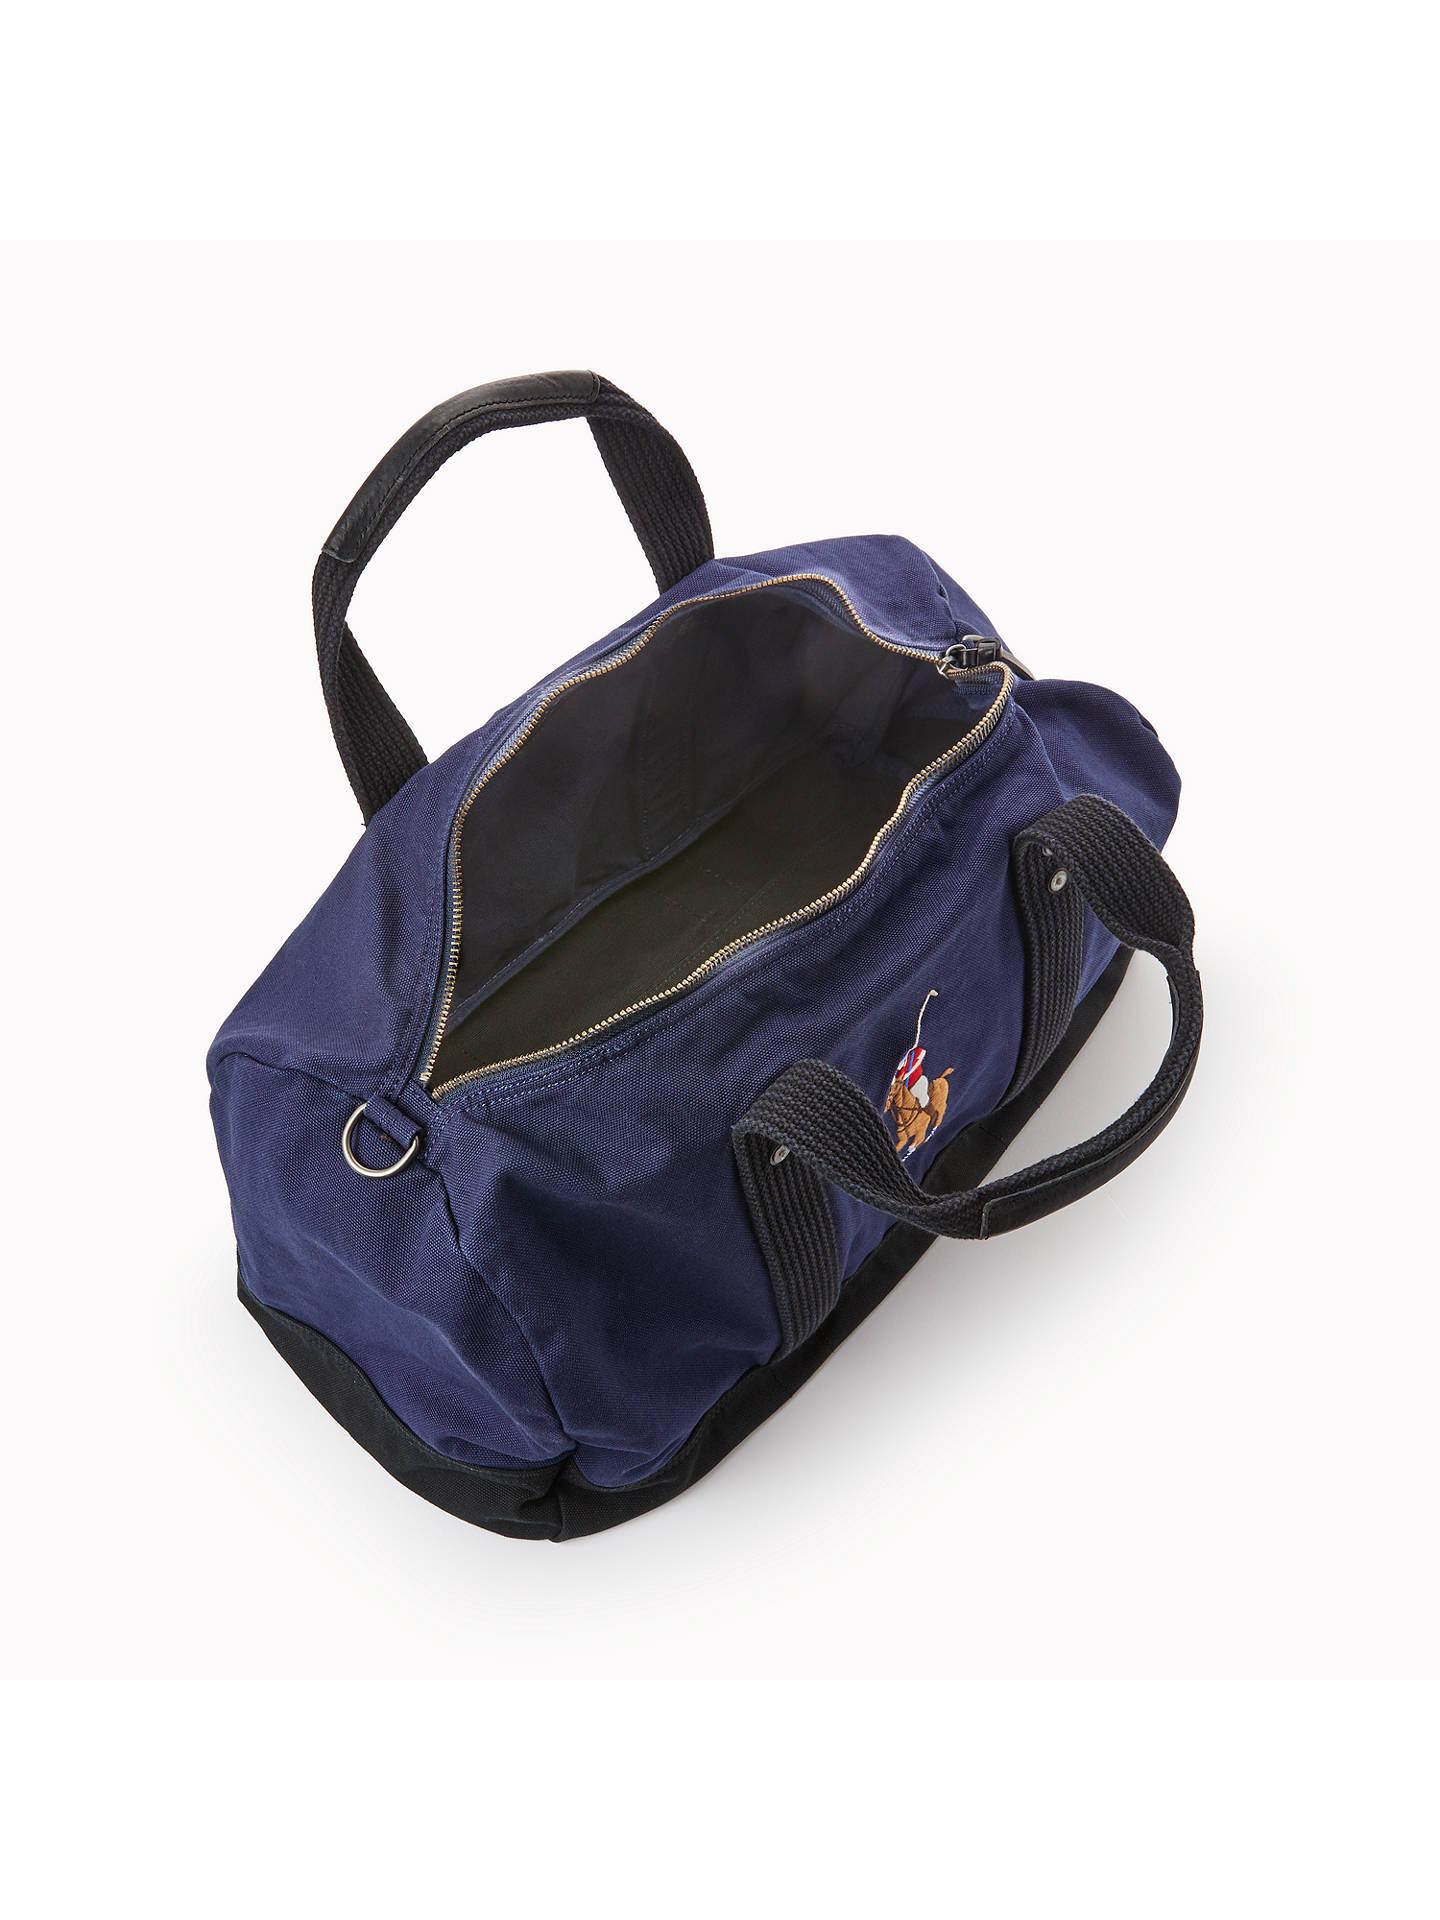 ... BuyPolo Ralph Lauren Canvas Big Pony Duffle Bag, Navy Online at  johnlewis.com ... 3985a1455a